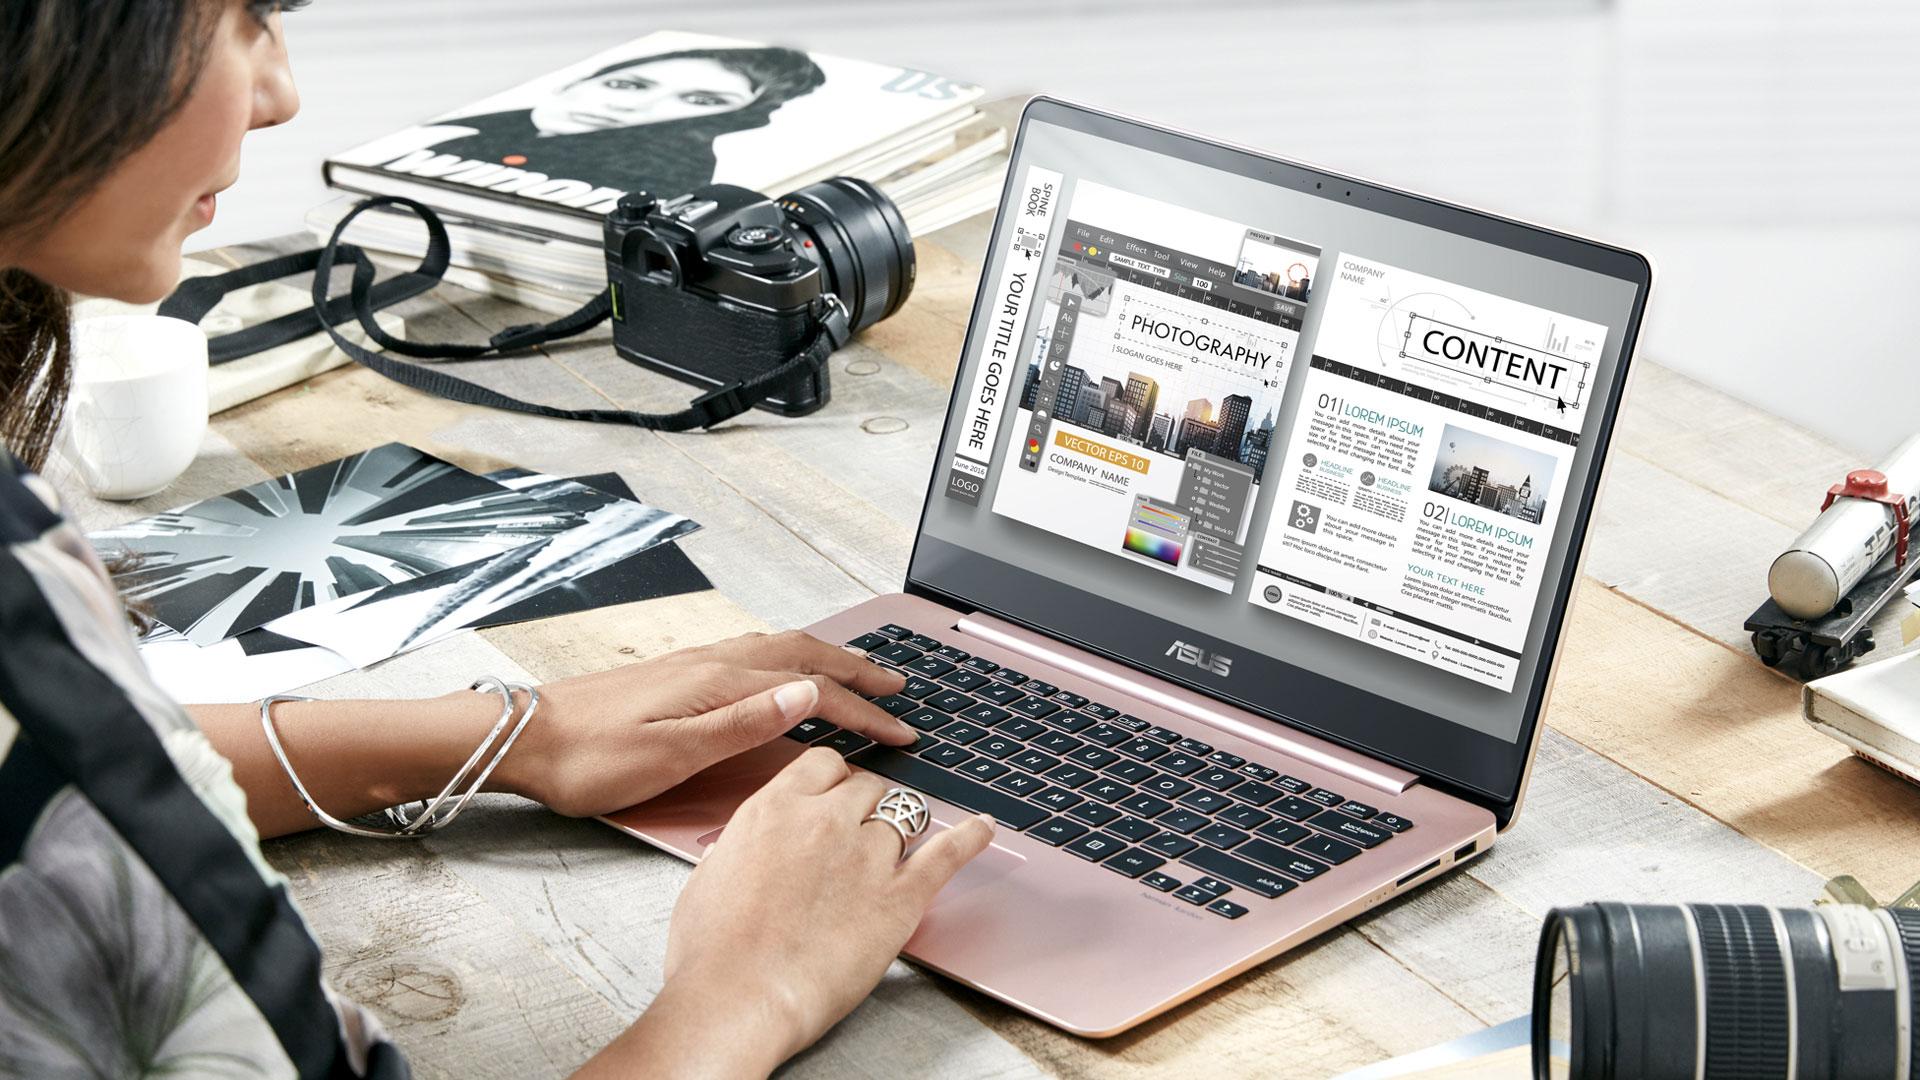 Meet The Asus Zenbook Ux430 Notebook Pc Asus Global